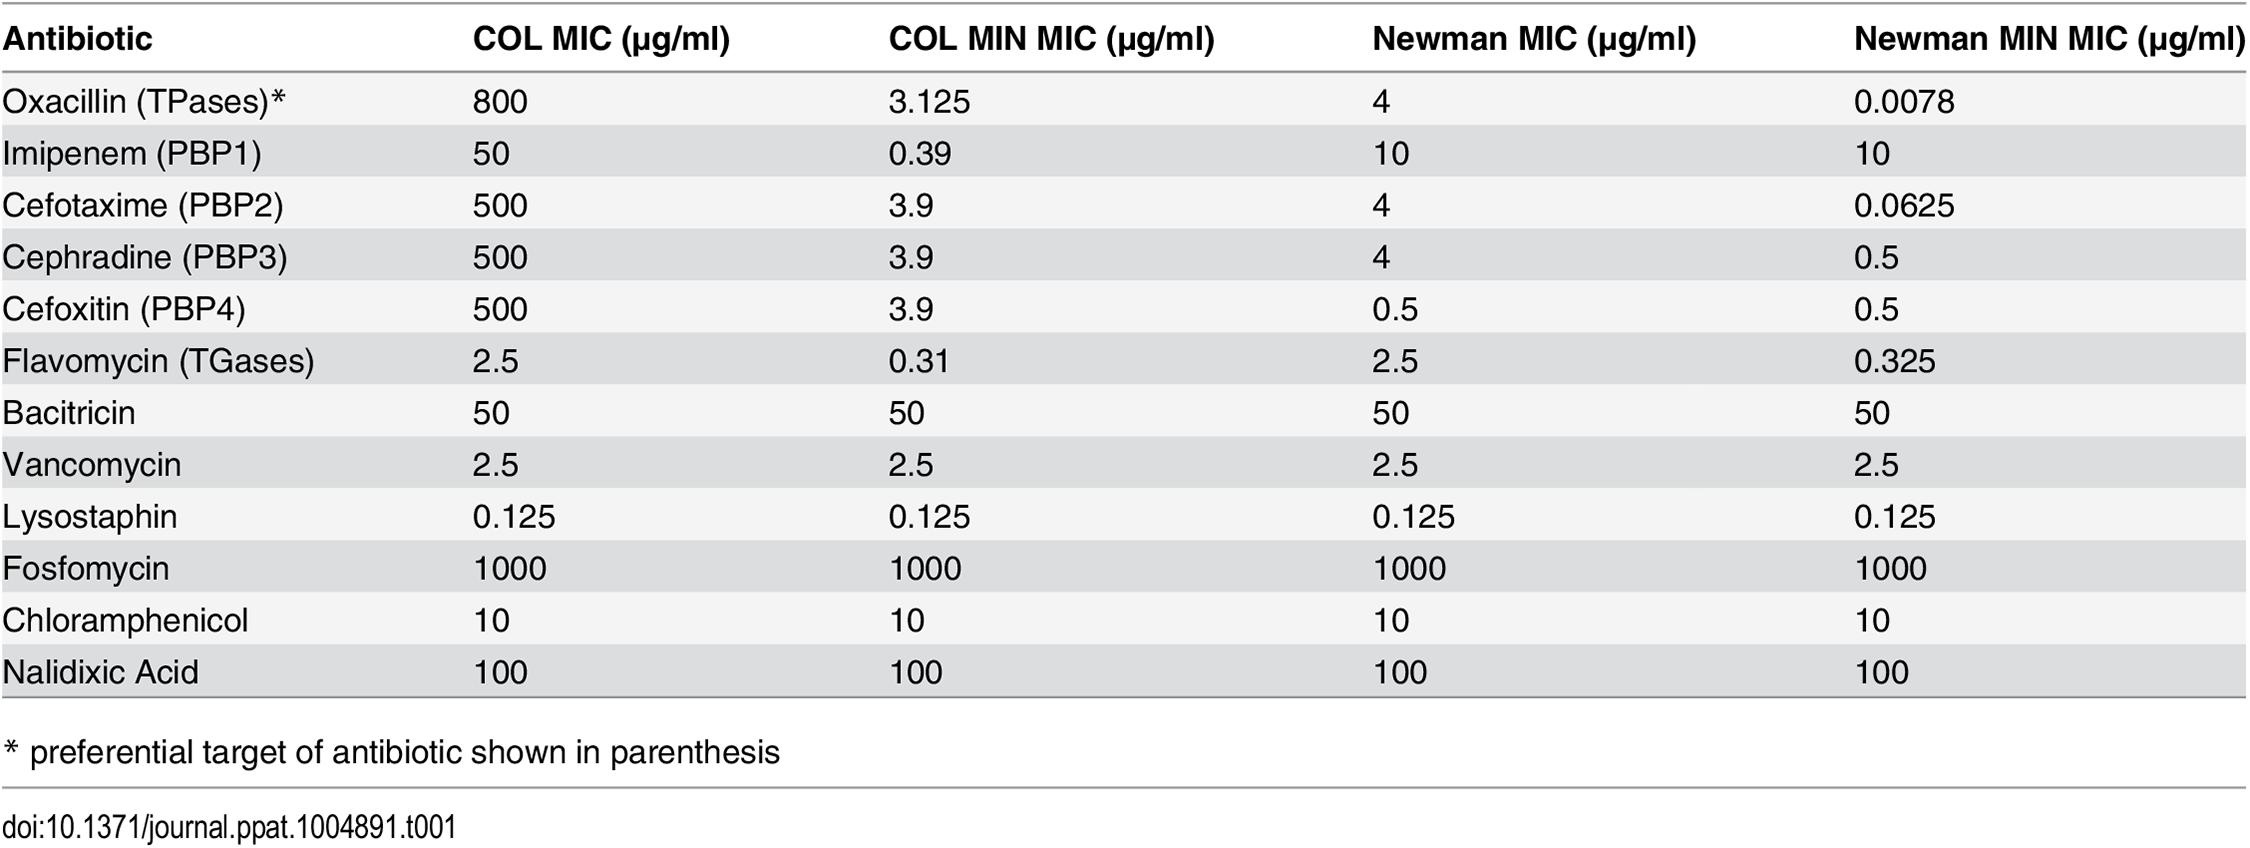 MICs of antibiotics for parental and mutant strains.